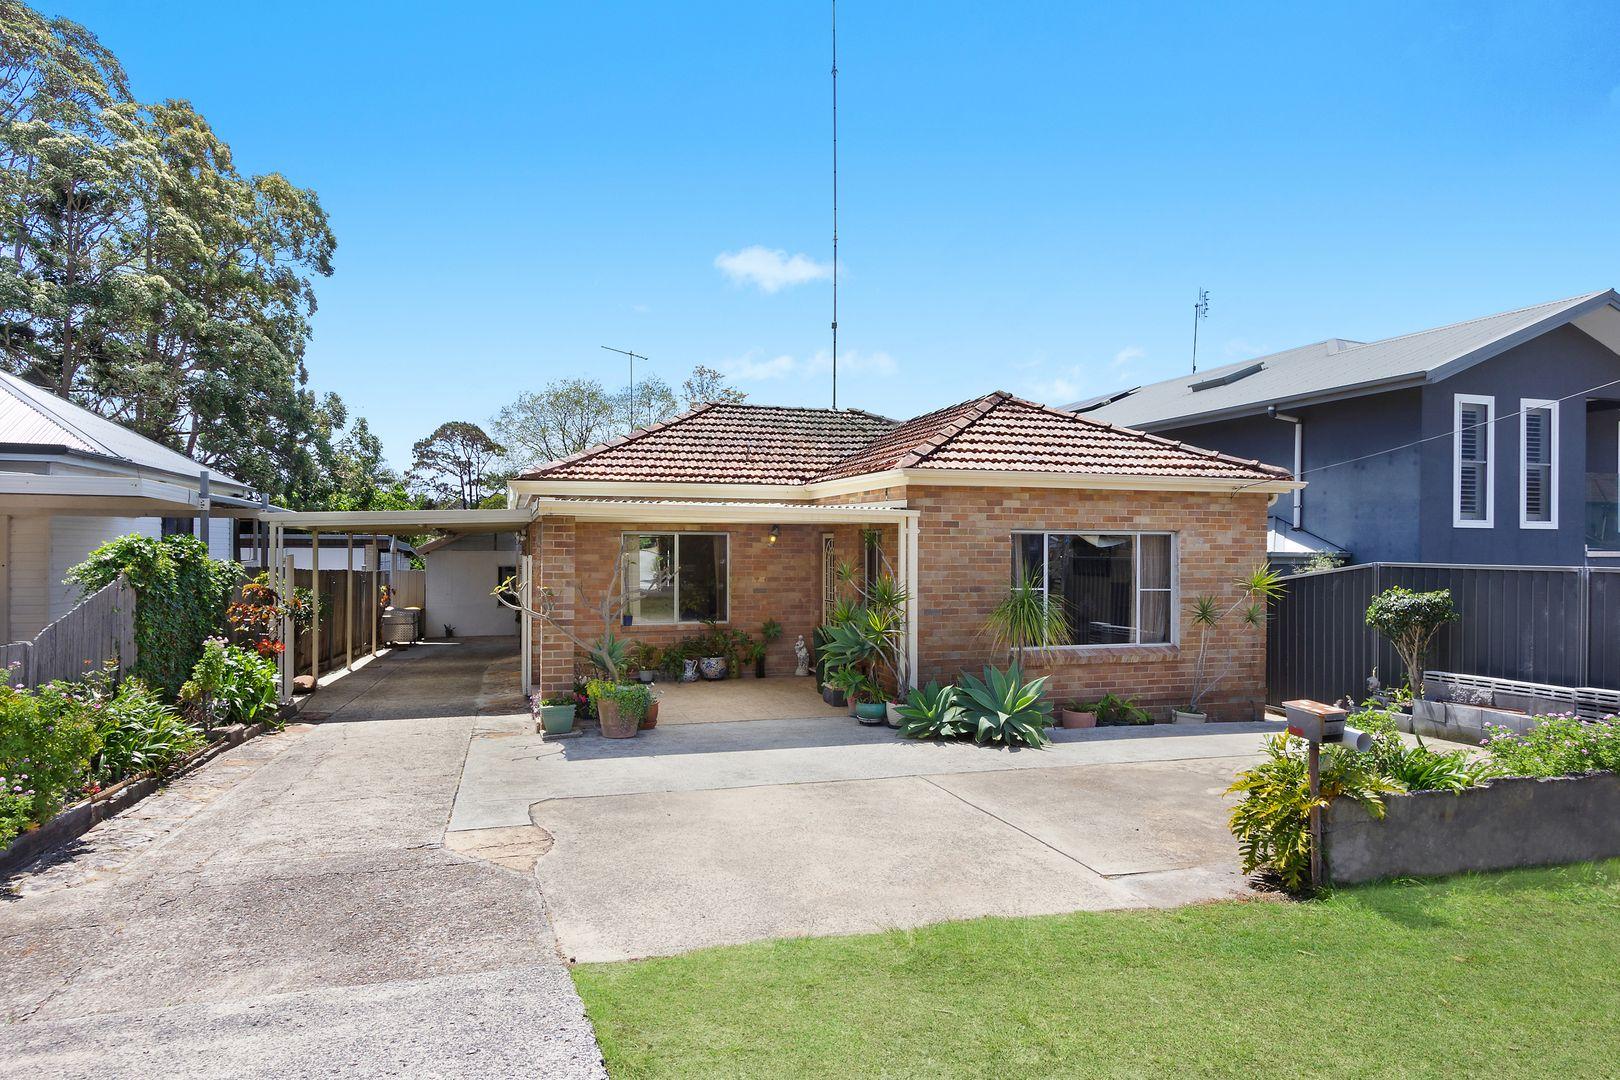 20 Carawa  Road, Cromer NSW 2099, Image 0